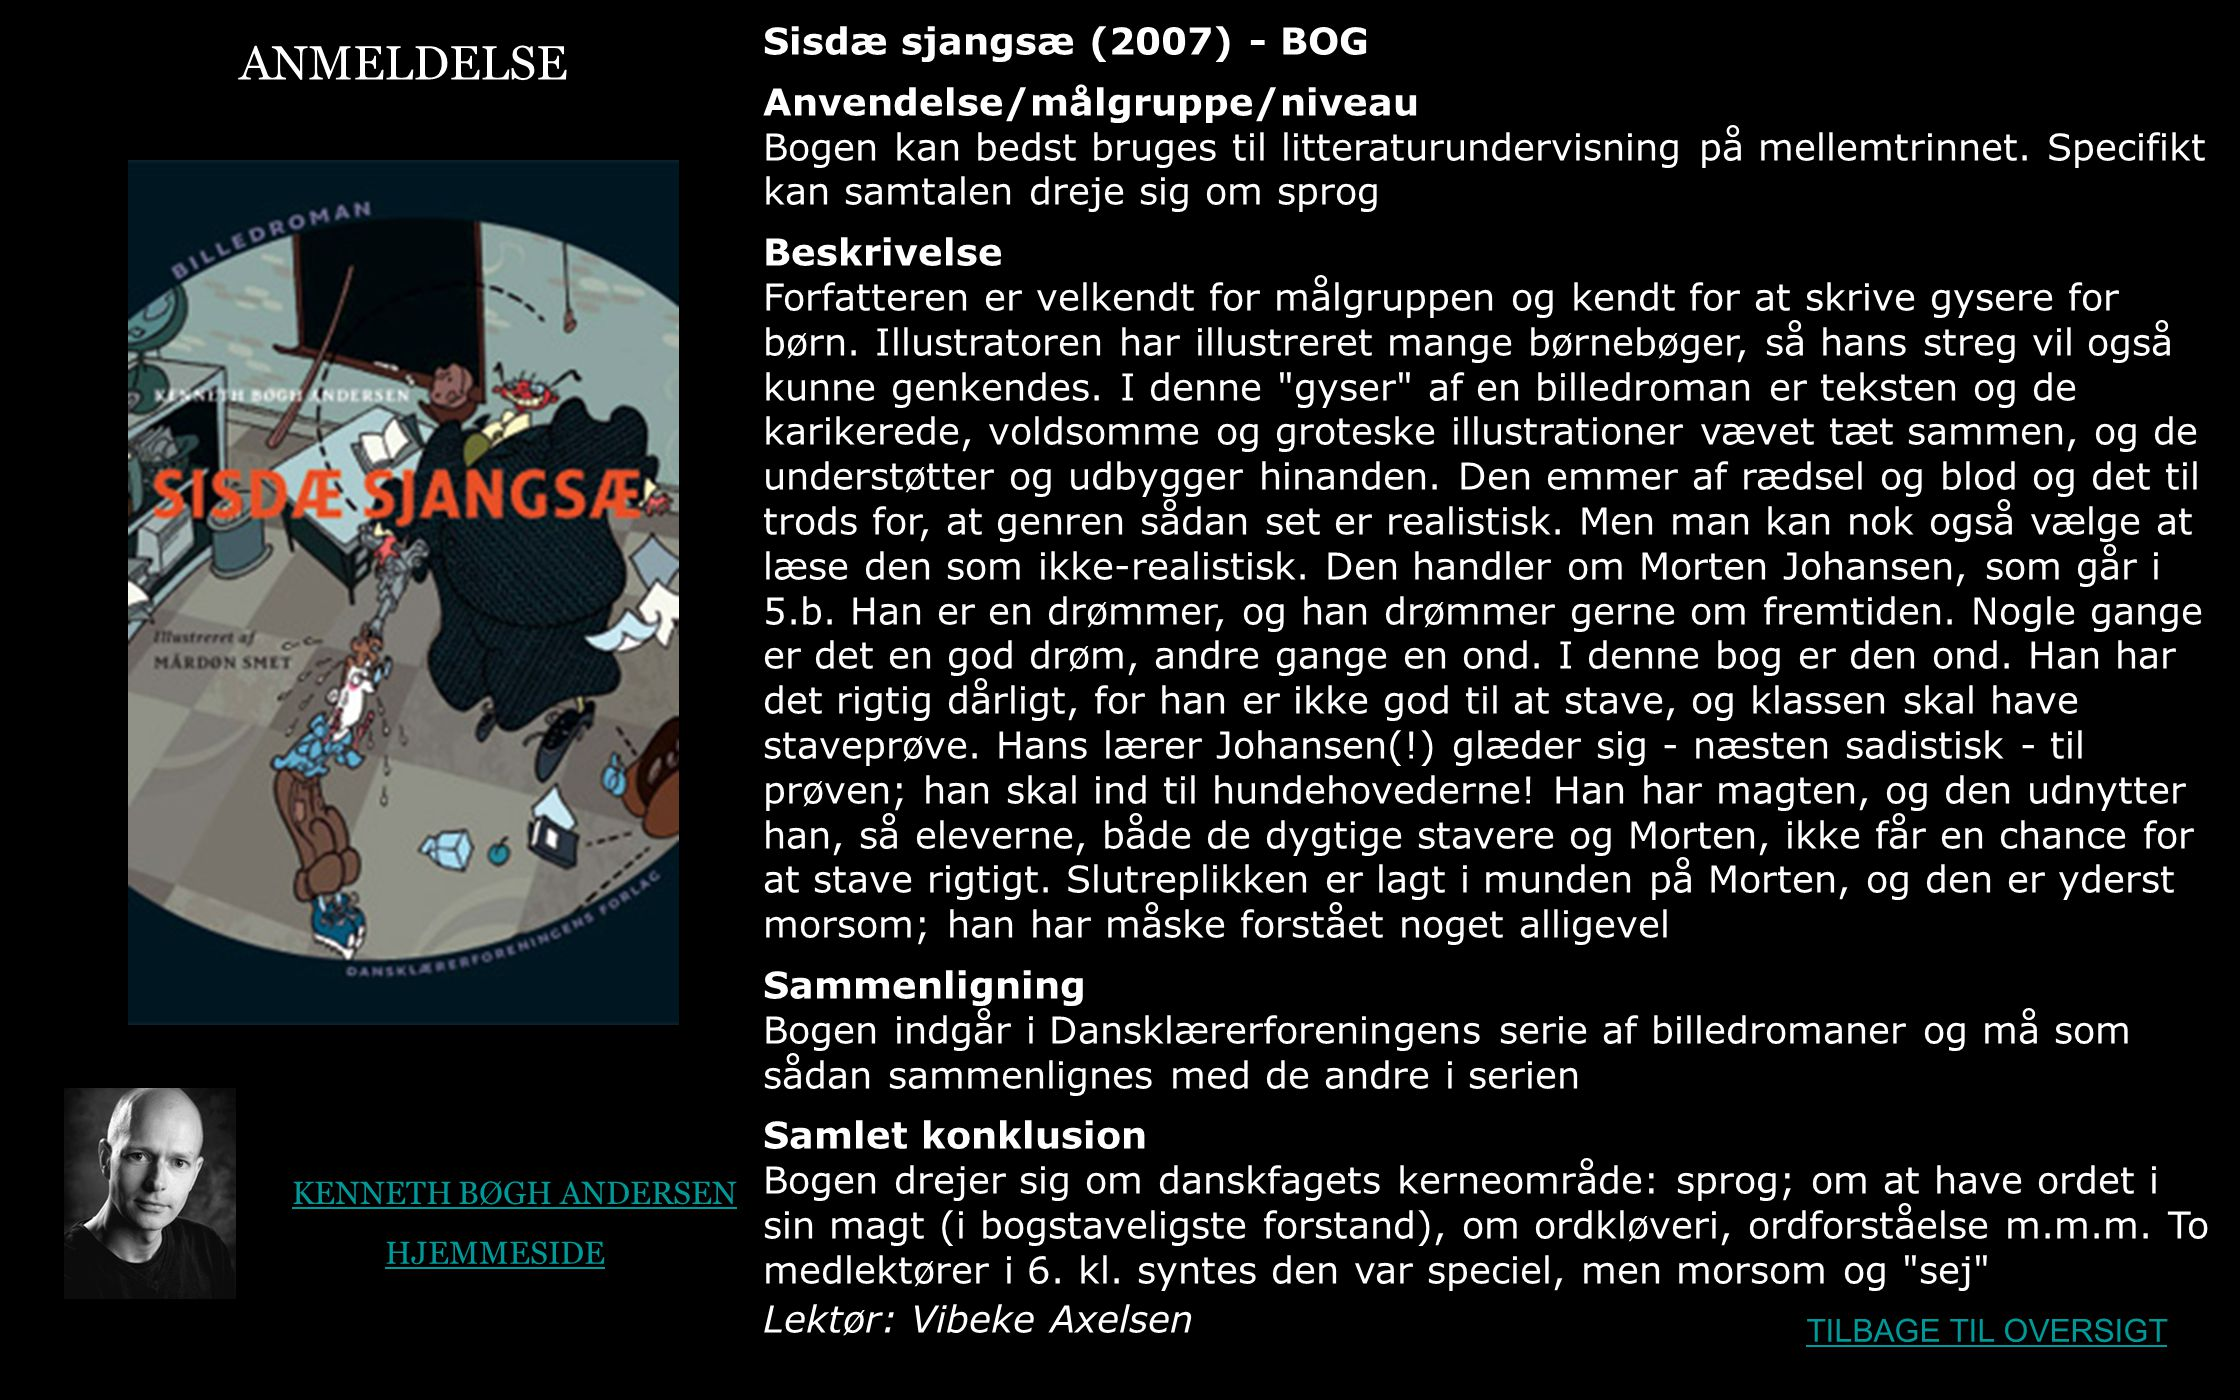 ANMELDELSE Sisdæ sjangsæ (2007) - BOG